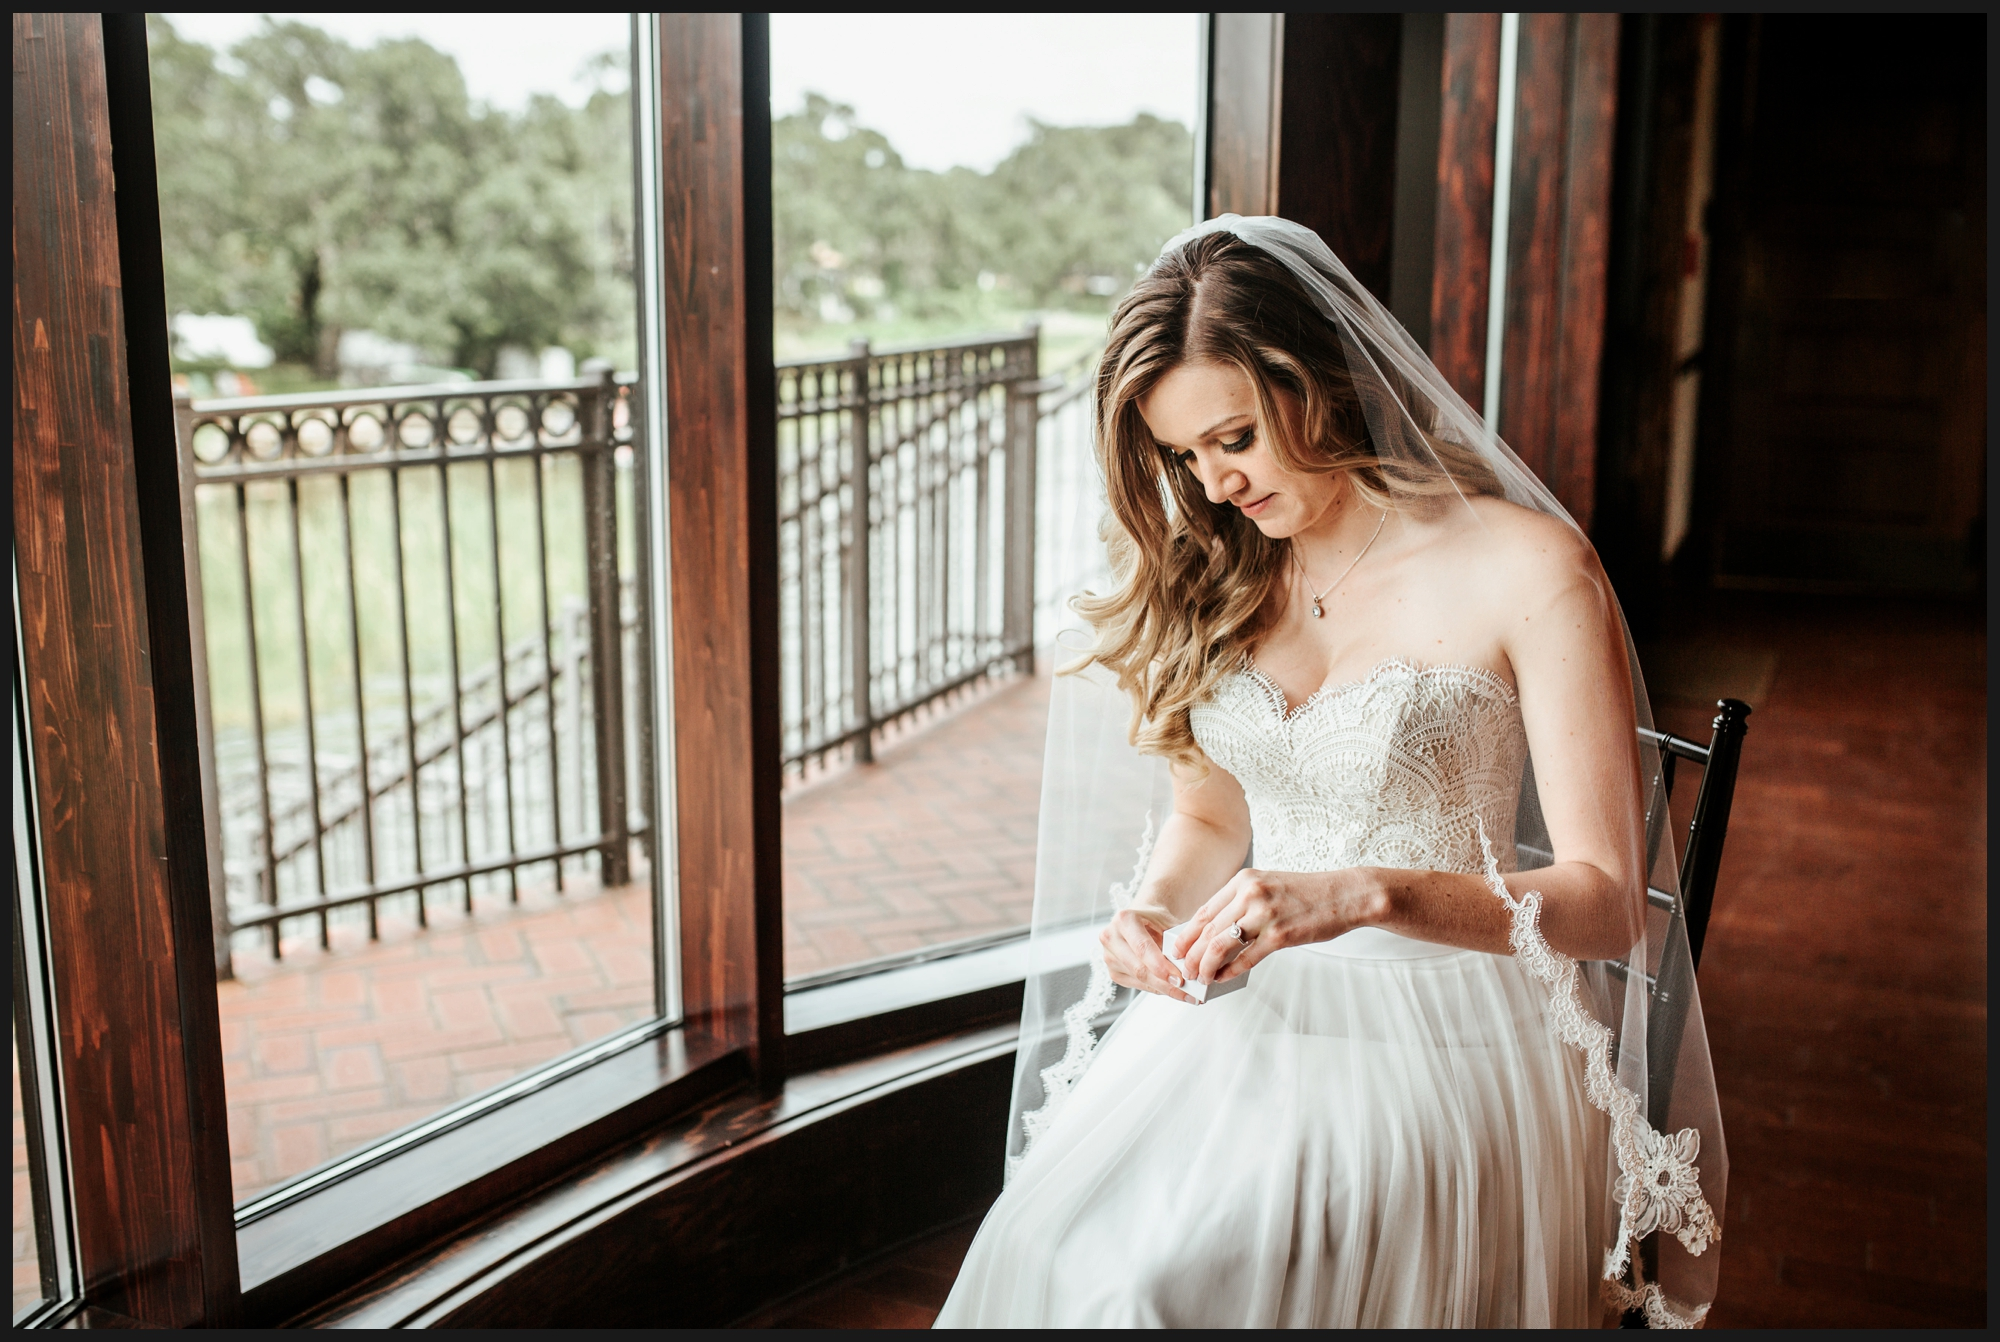 Orlando-Wedding-Photographer-destination-wedding-photographer-florida-wedding-photographer-bohemian-wedding-photographer_0261.jpg